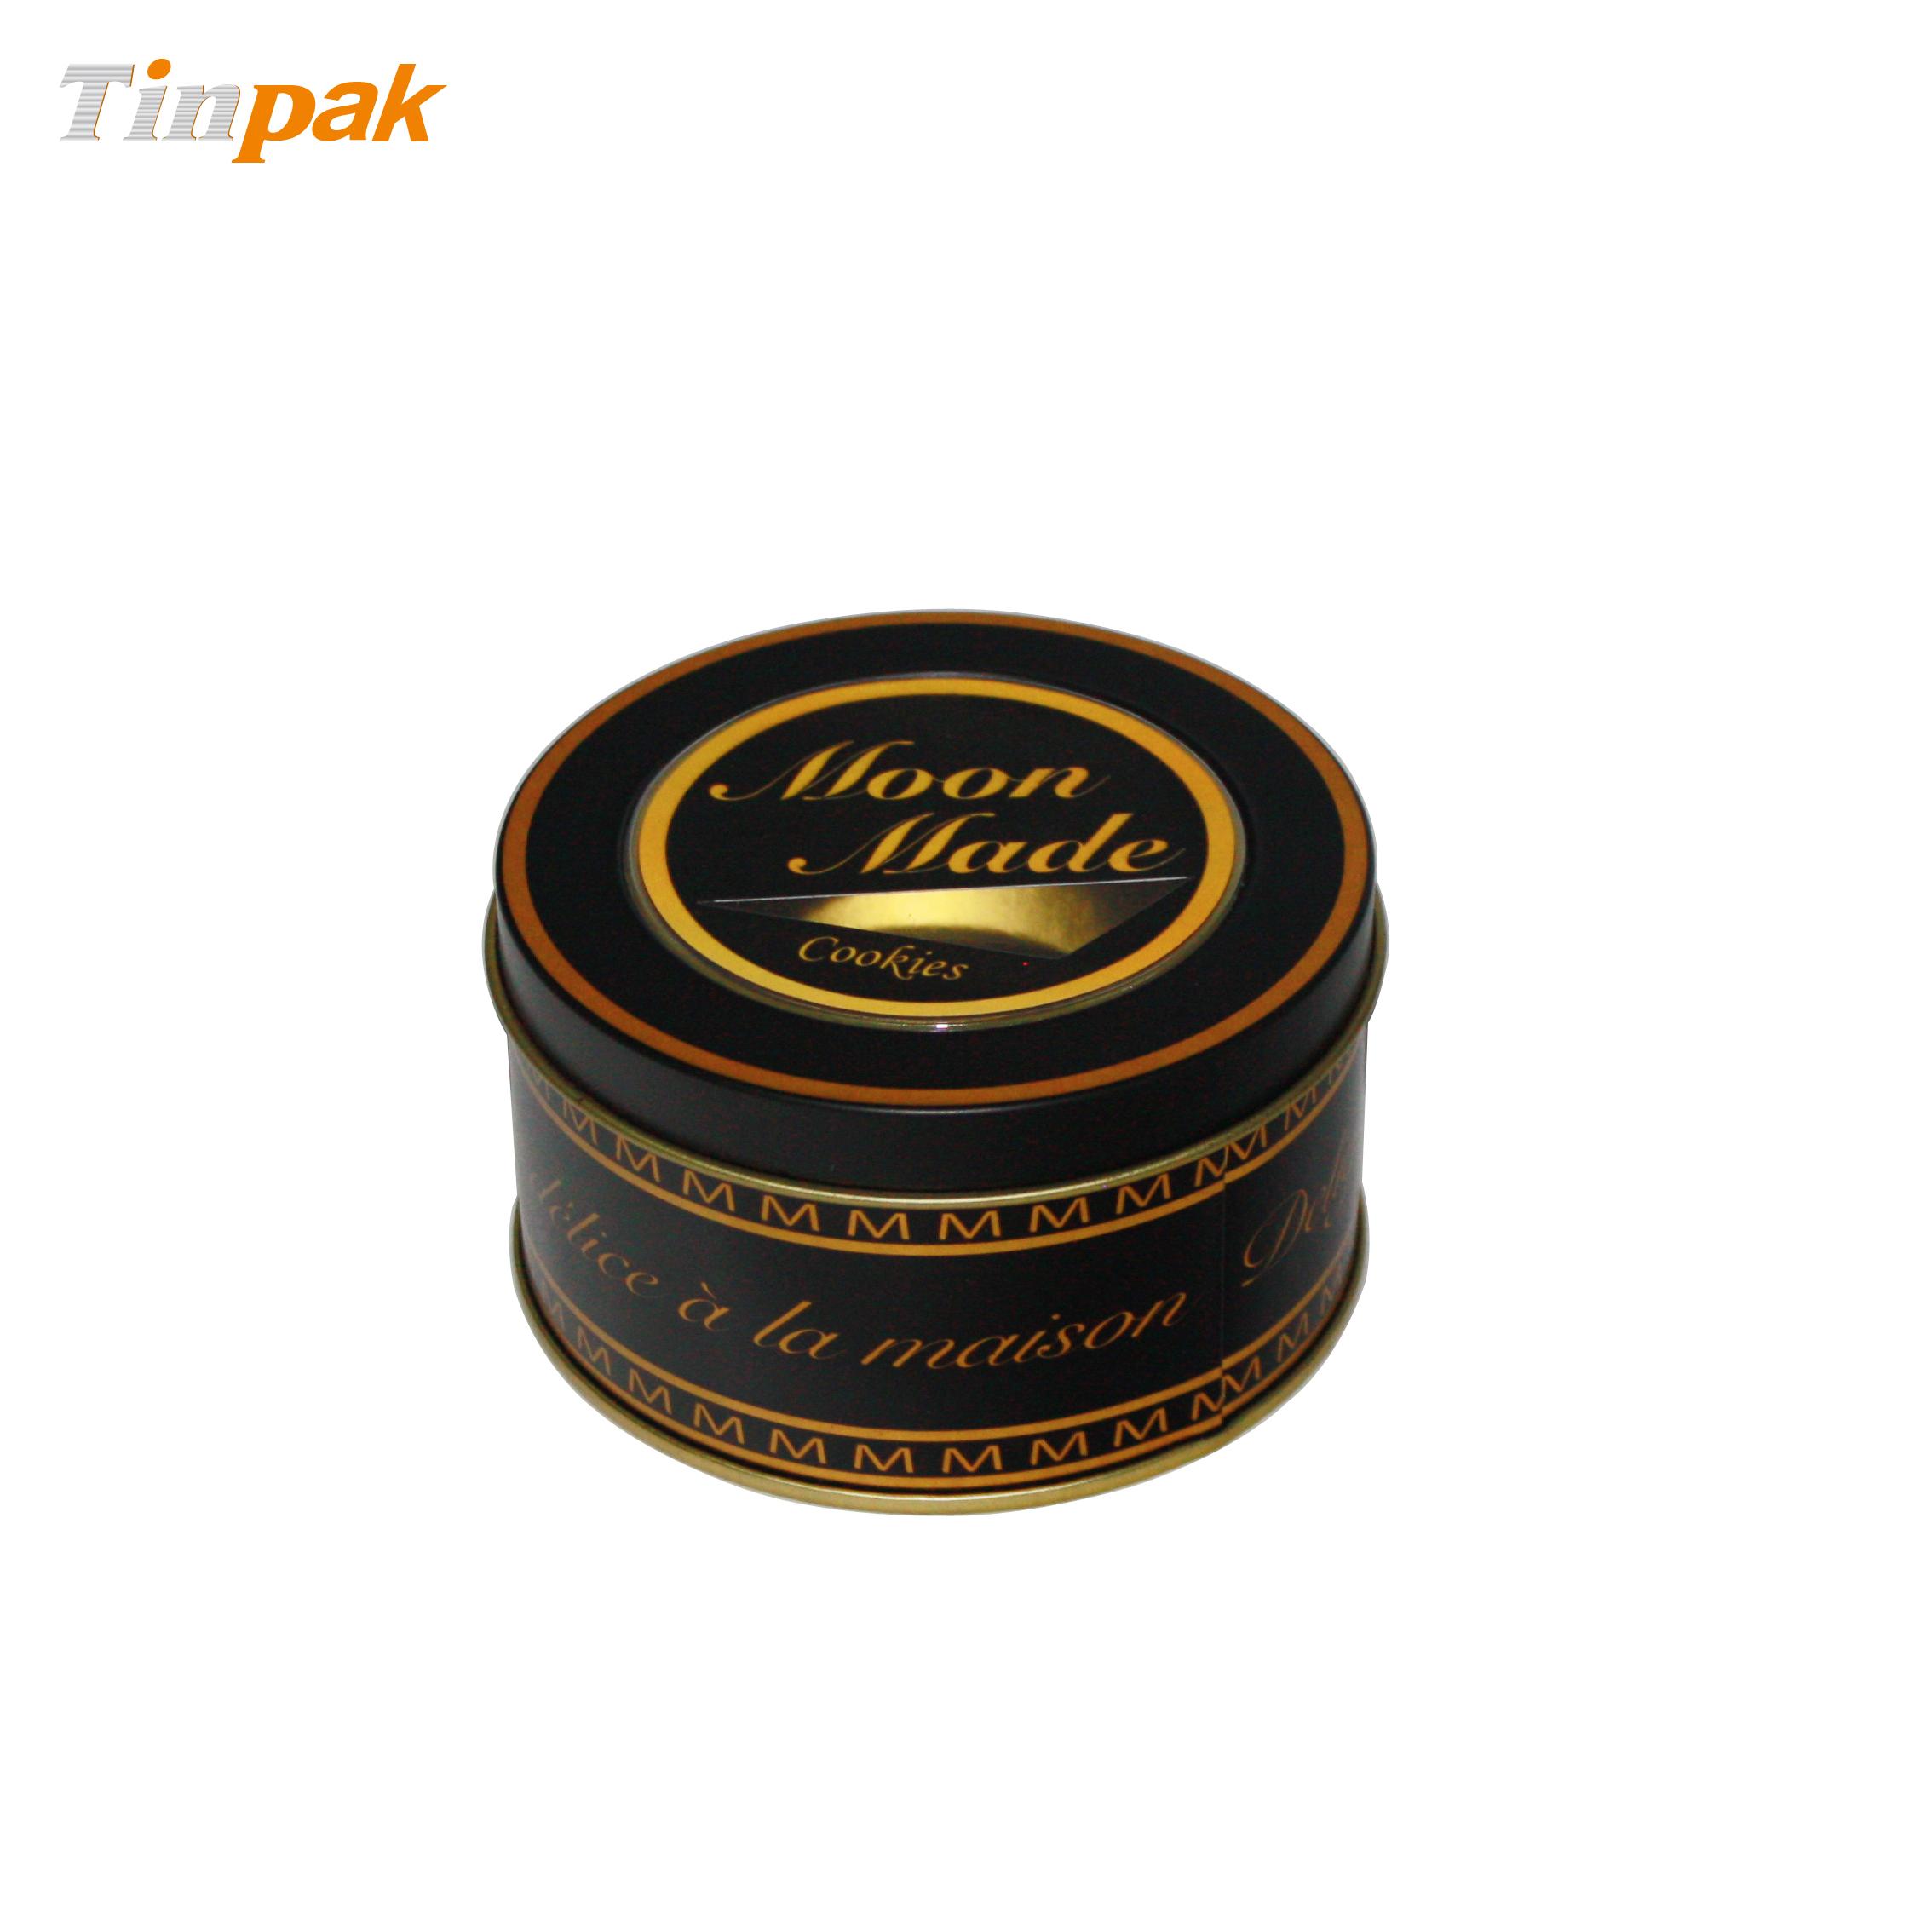 Round cookie metal tins wholesaler